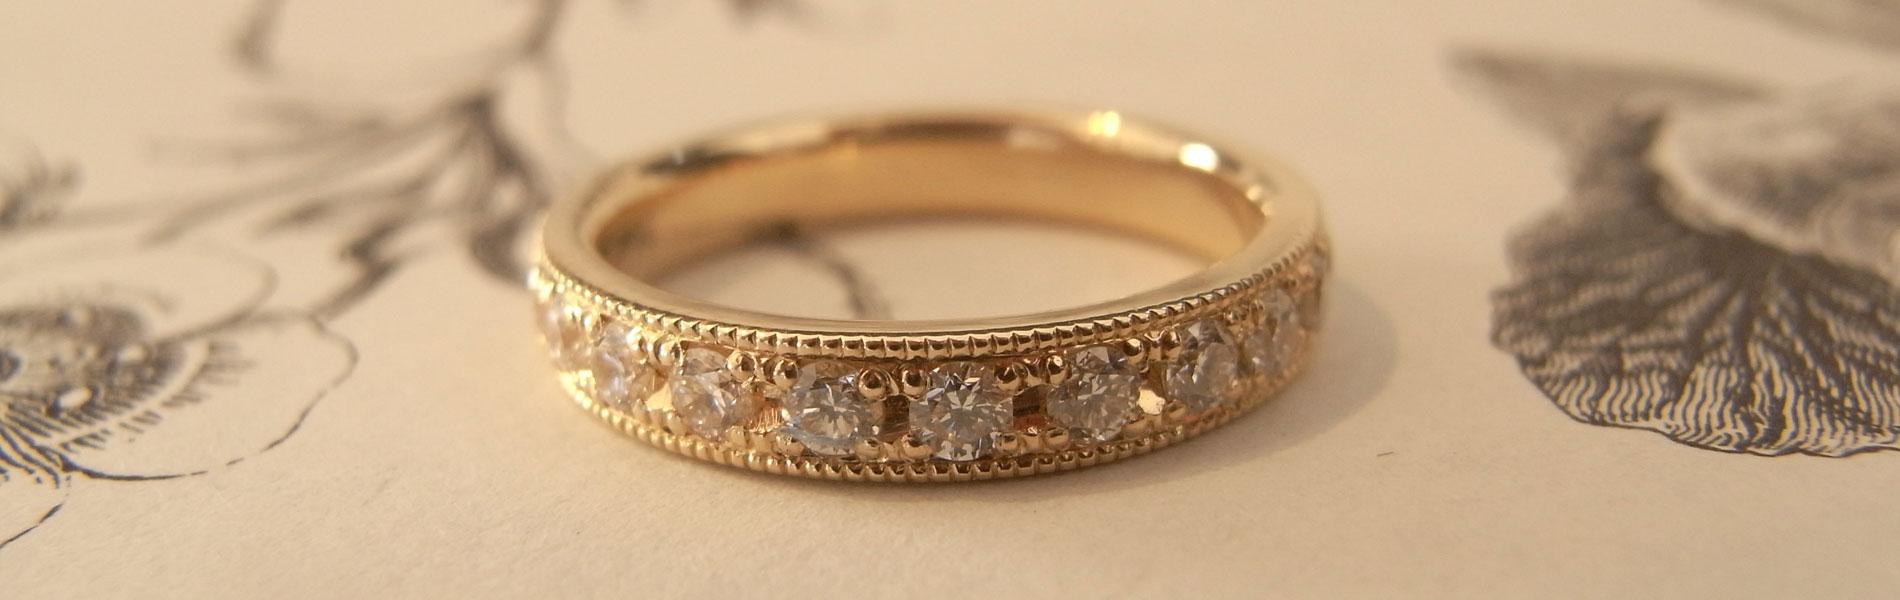 結婚指輪 手作り 群馬県 高崎市